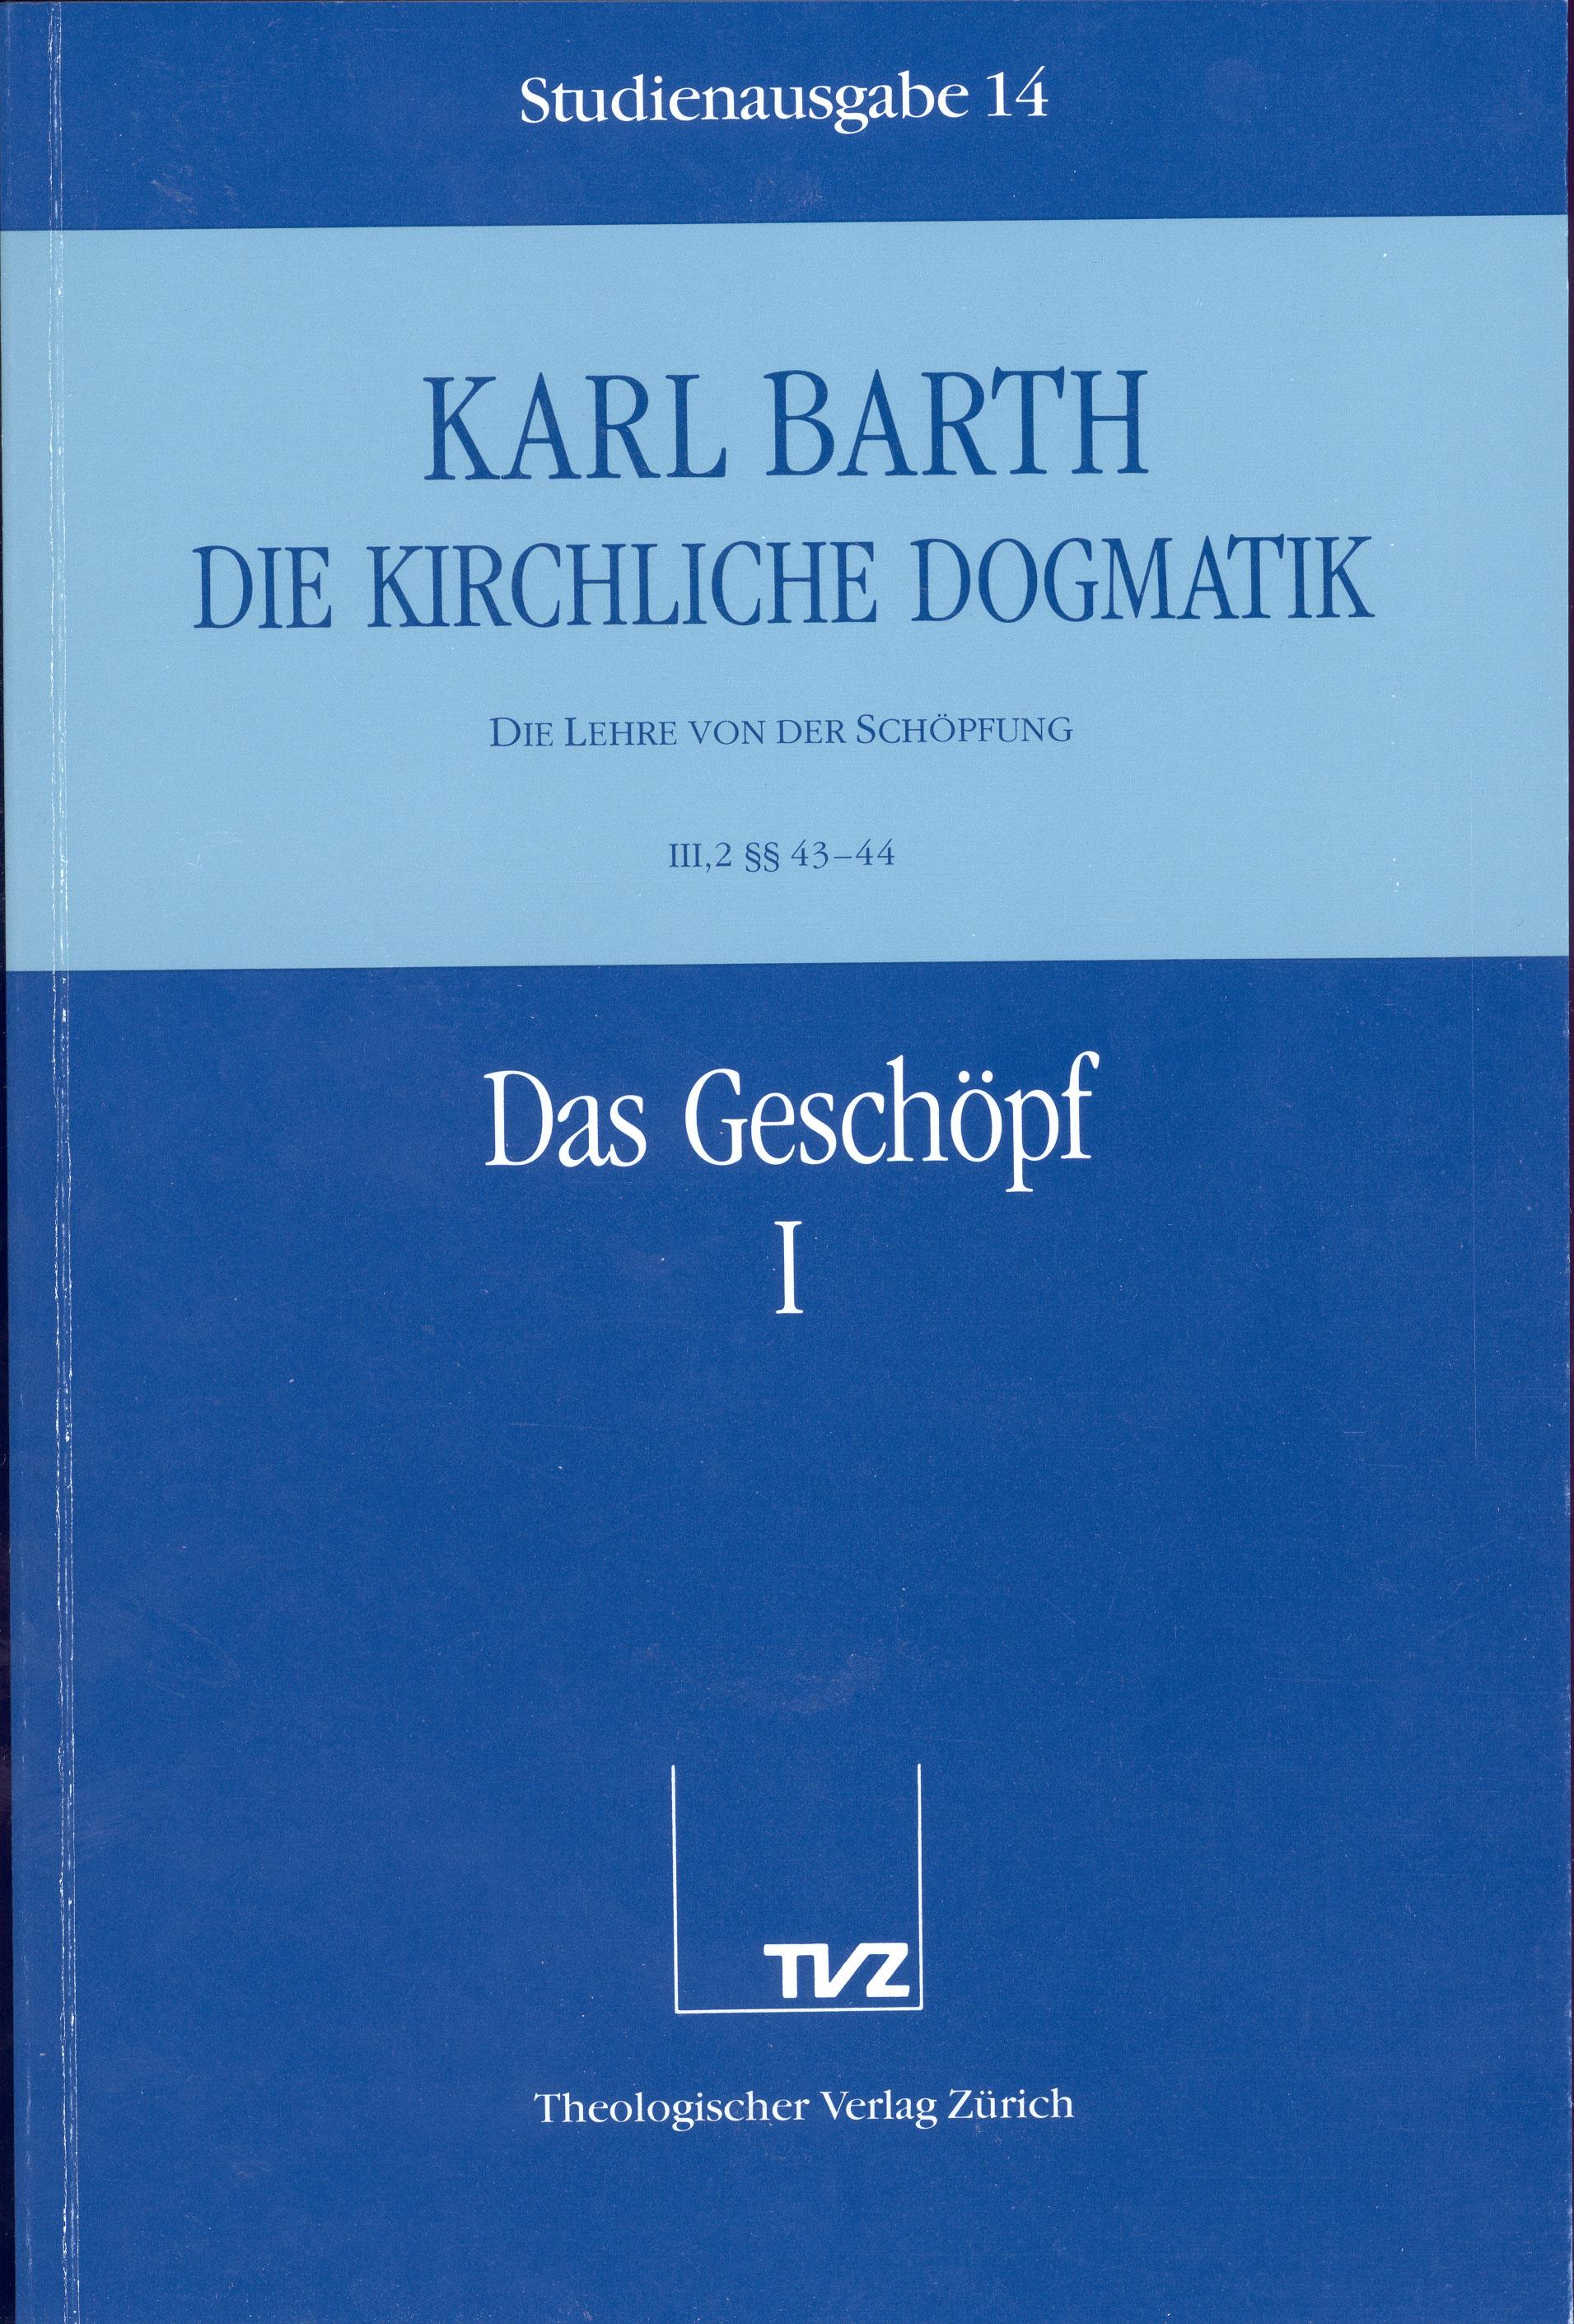 Kirchliche Dogmatik Bd. 14 - Das Geschöpf I Karl Barth